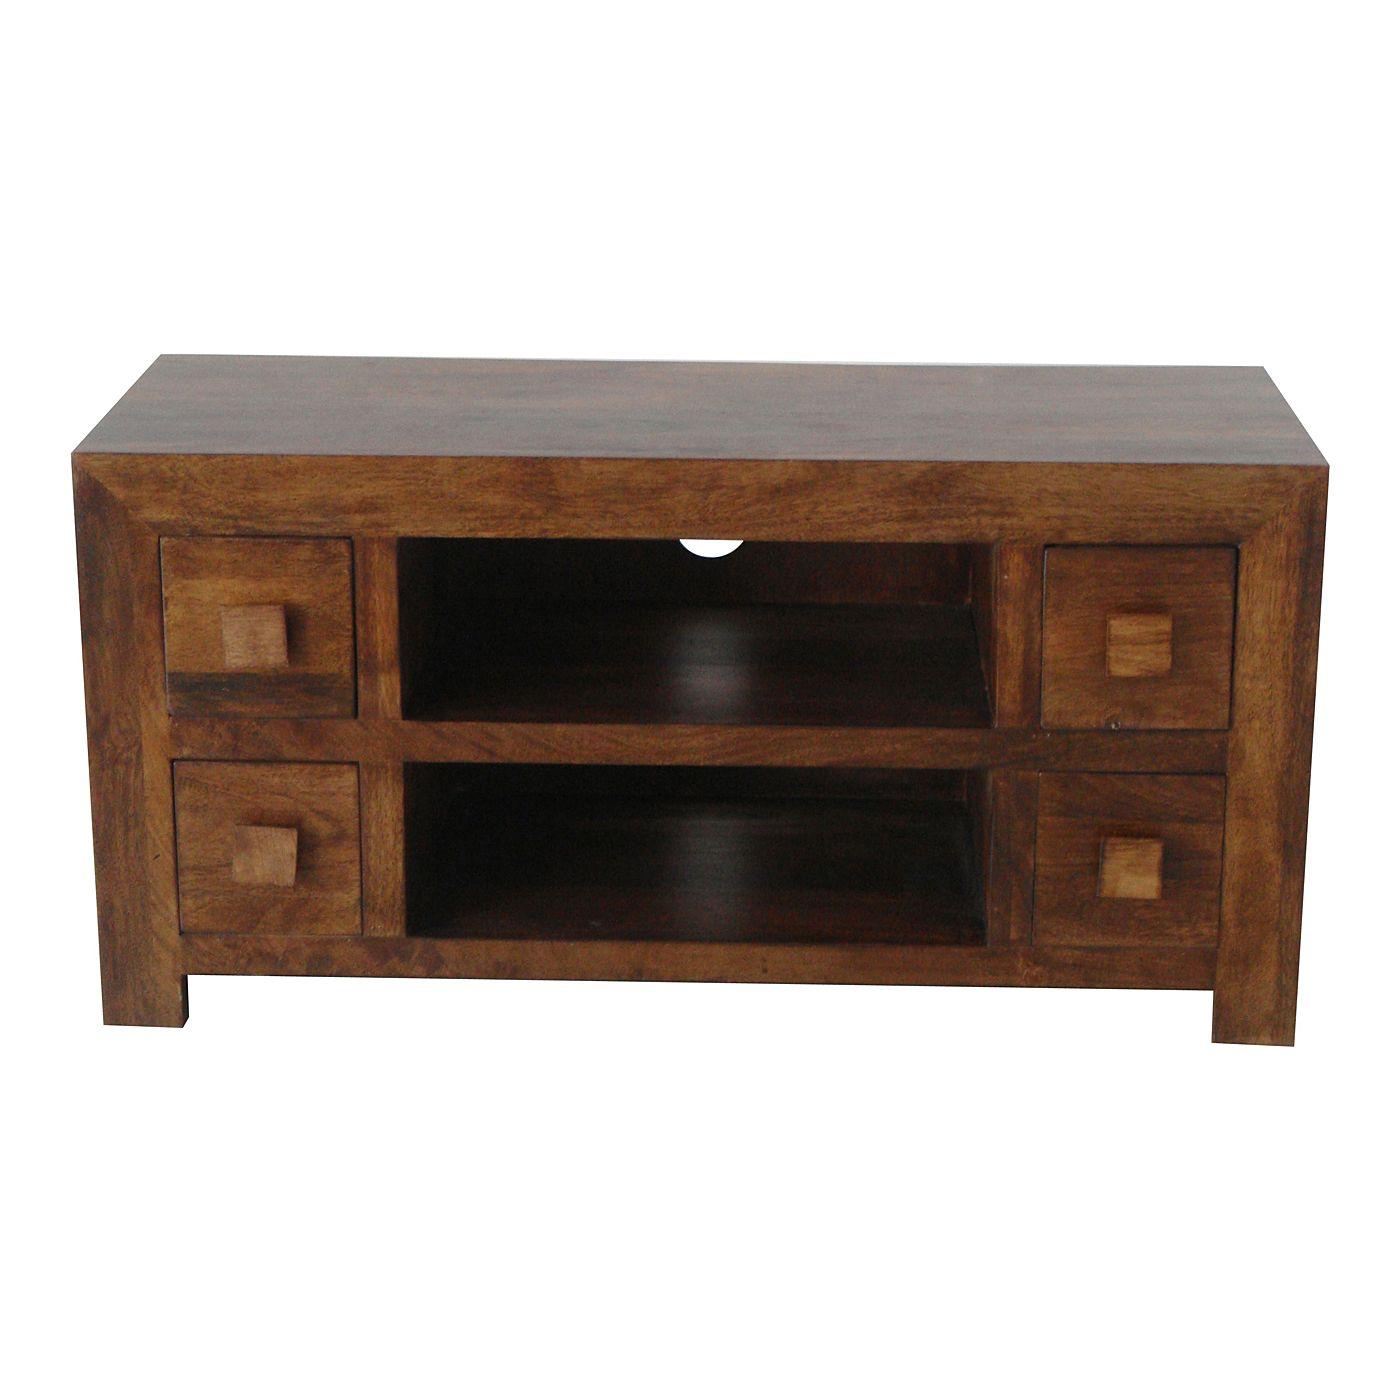 Sites Asda Site Mango Wood Tv Unit Wood Tv Unit Tv Stand Wood [ 1400 x 1400 Pixel ]